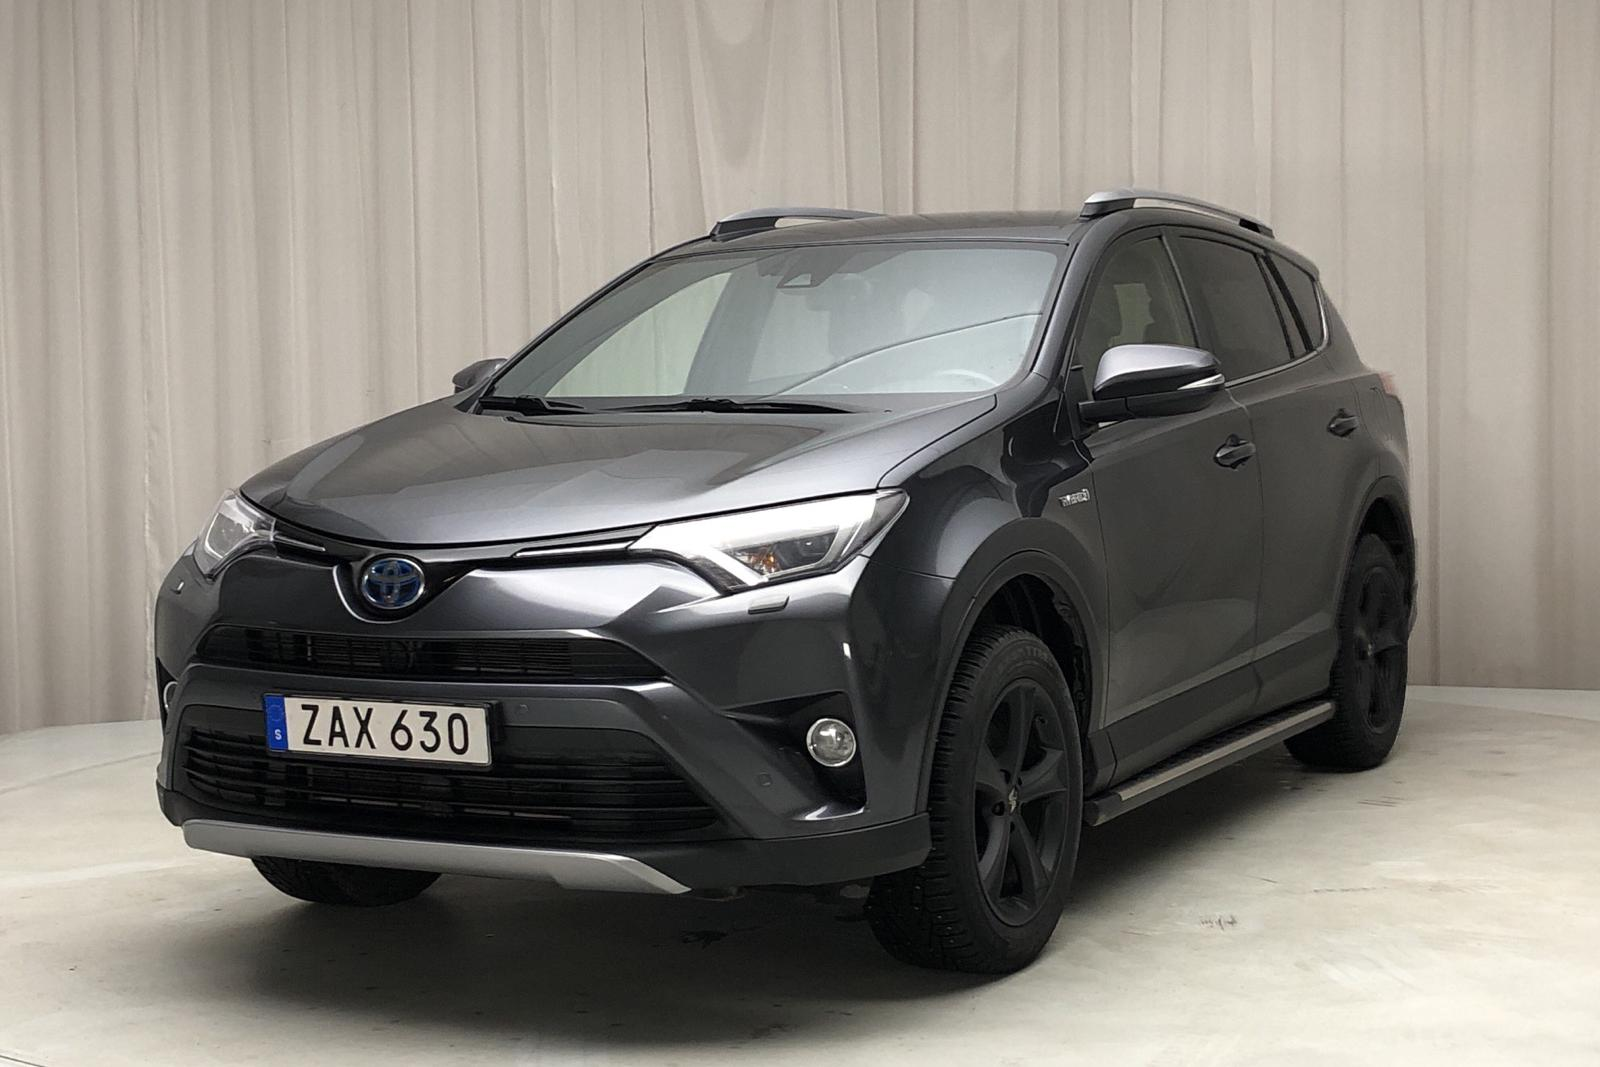 Toyota RAV4 2.5 HSD AWD (197hk) - 10 050 mil - Automat - Dark Grey - 2018